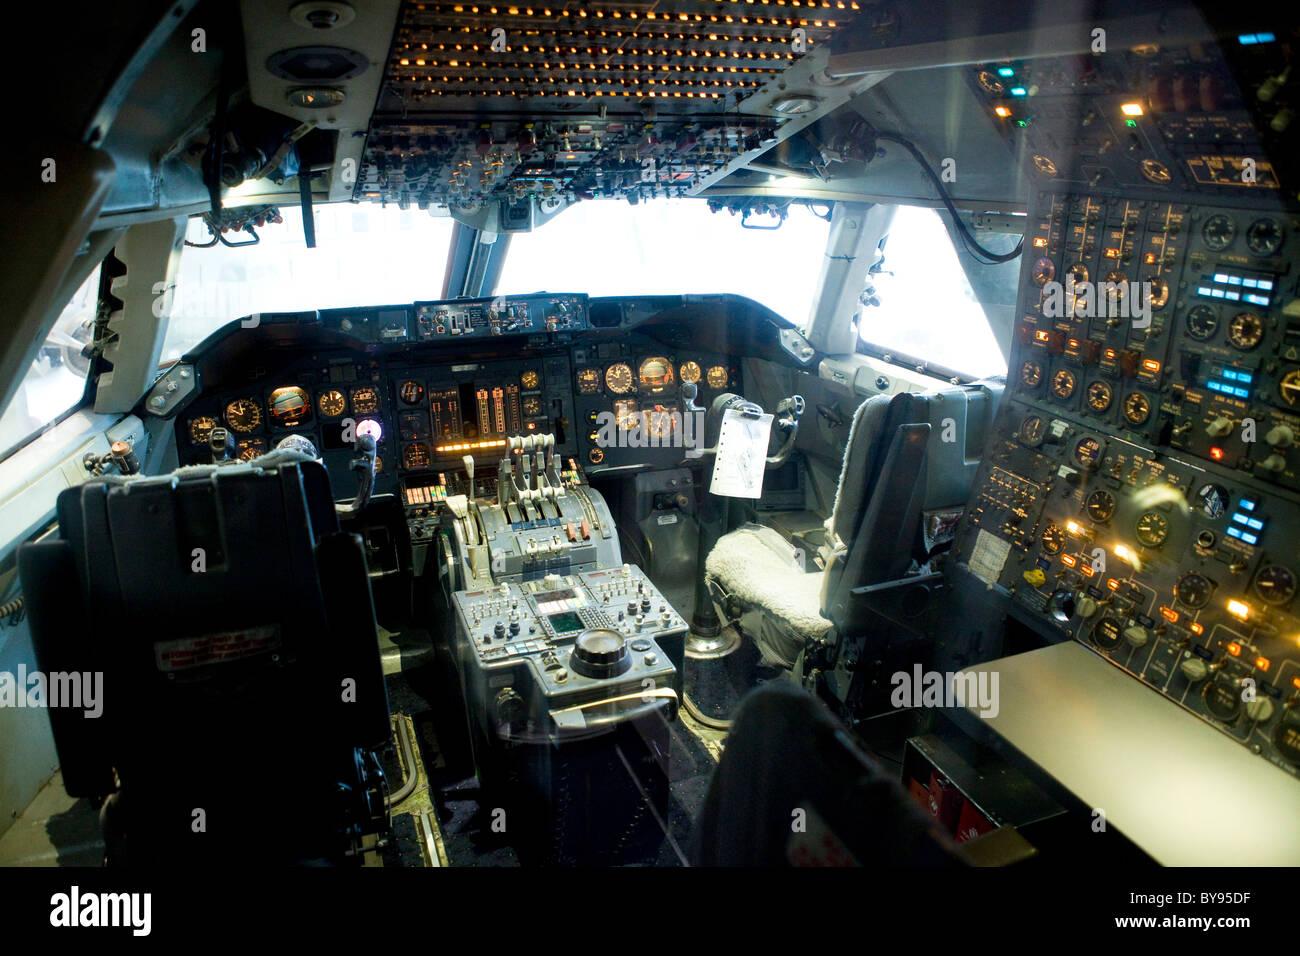 Cockpit view of Boeing 747 Jumbo jet - Stock Image